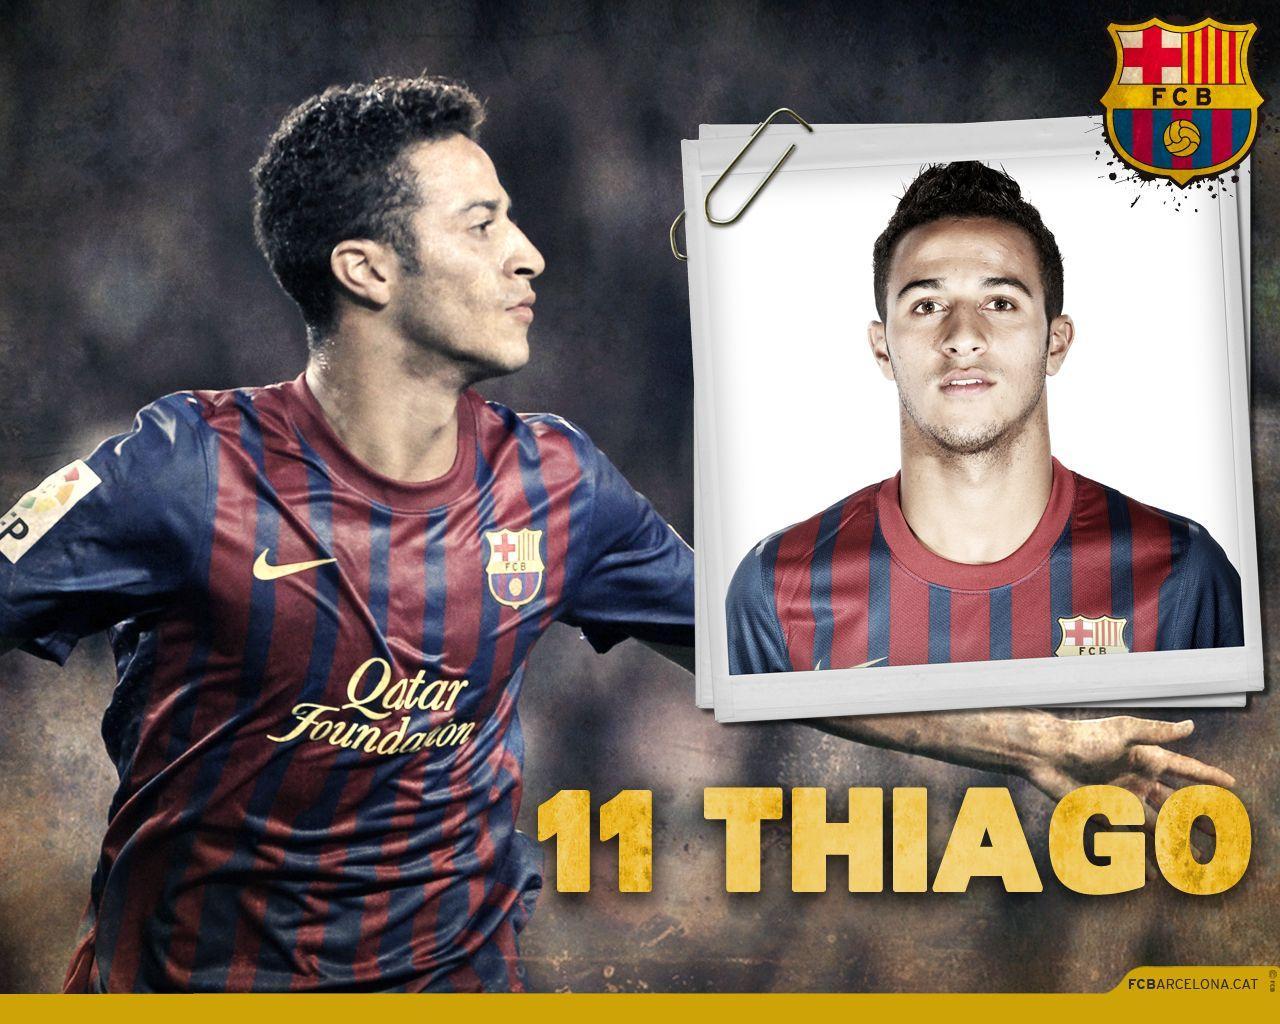 Thiago Alcantara Wallpaper | Player Wallpapers | Pinterest ...